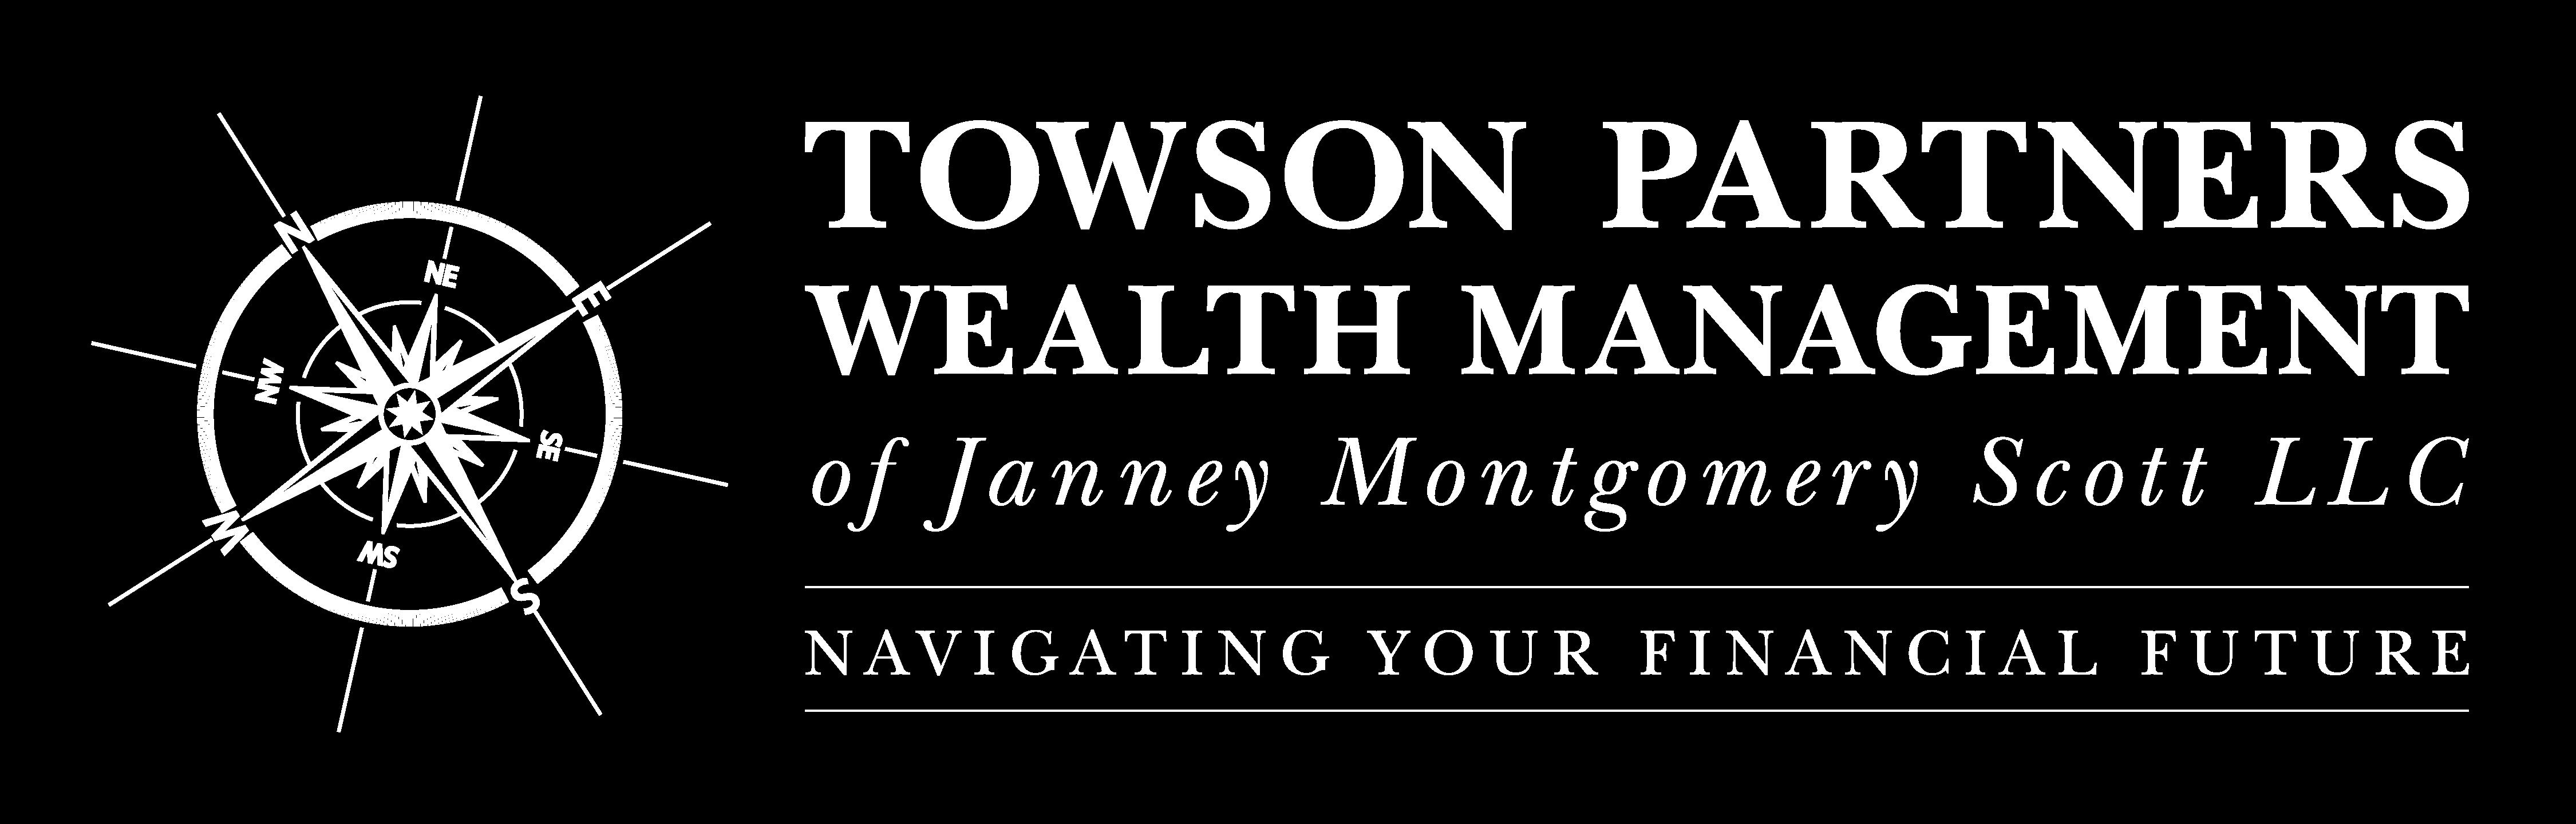 Towson Partners Wealth Management Profile Photo